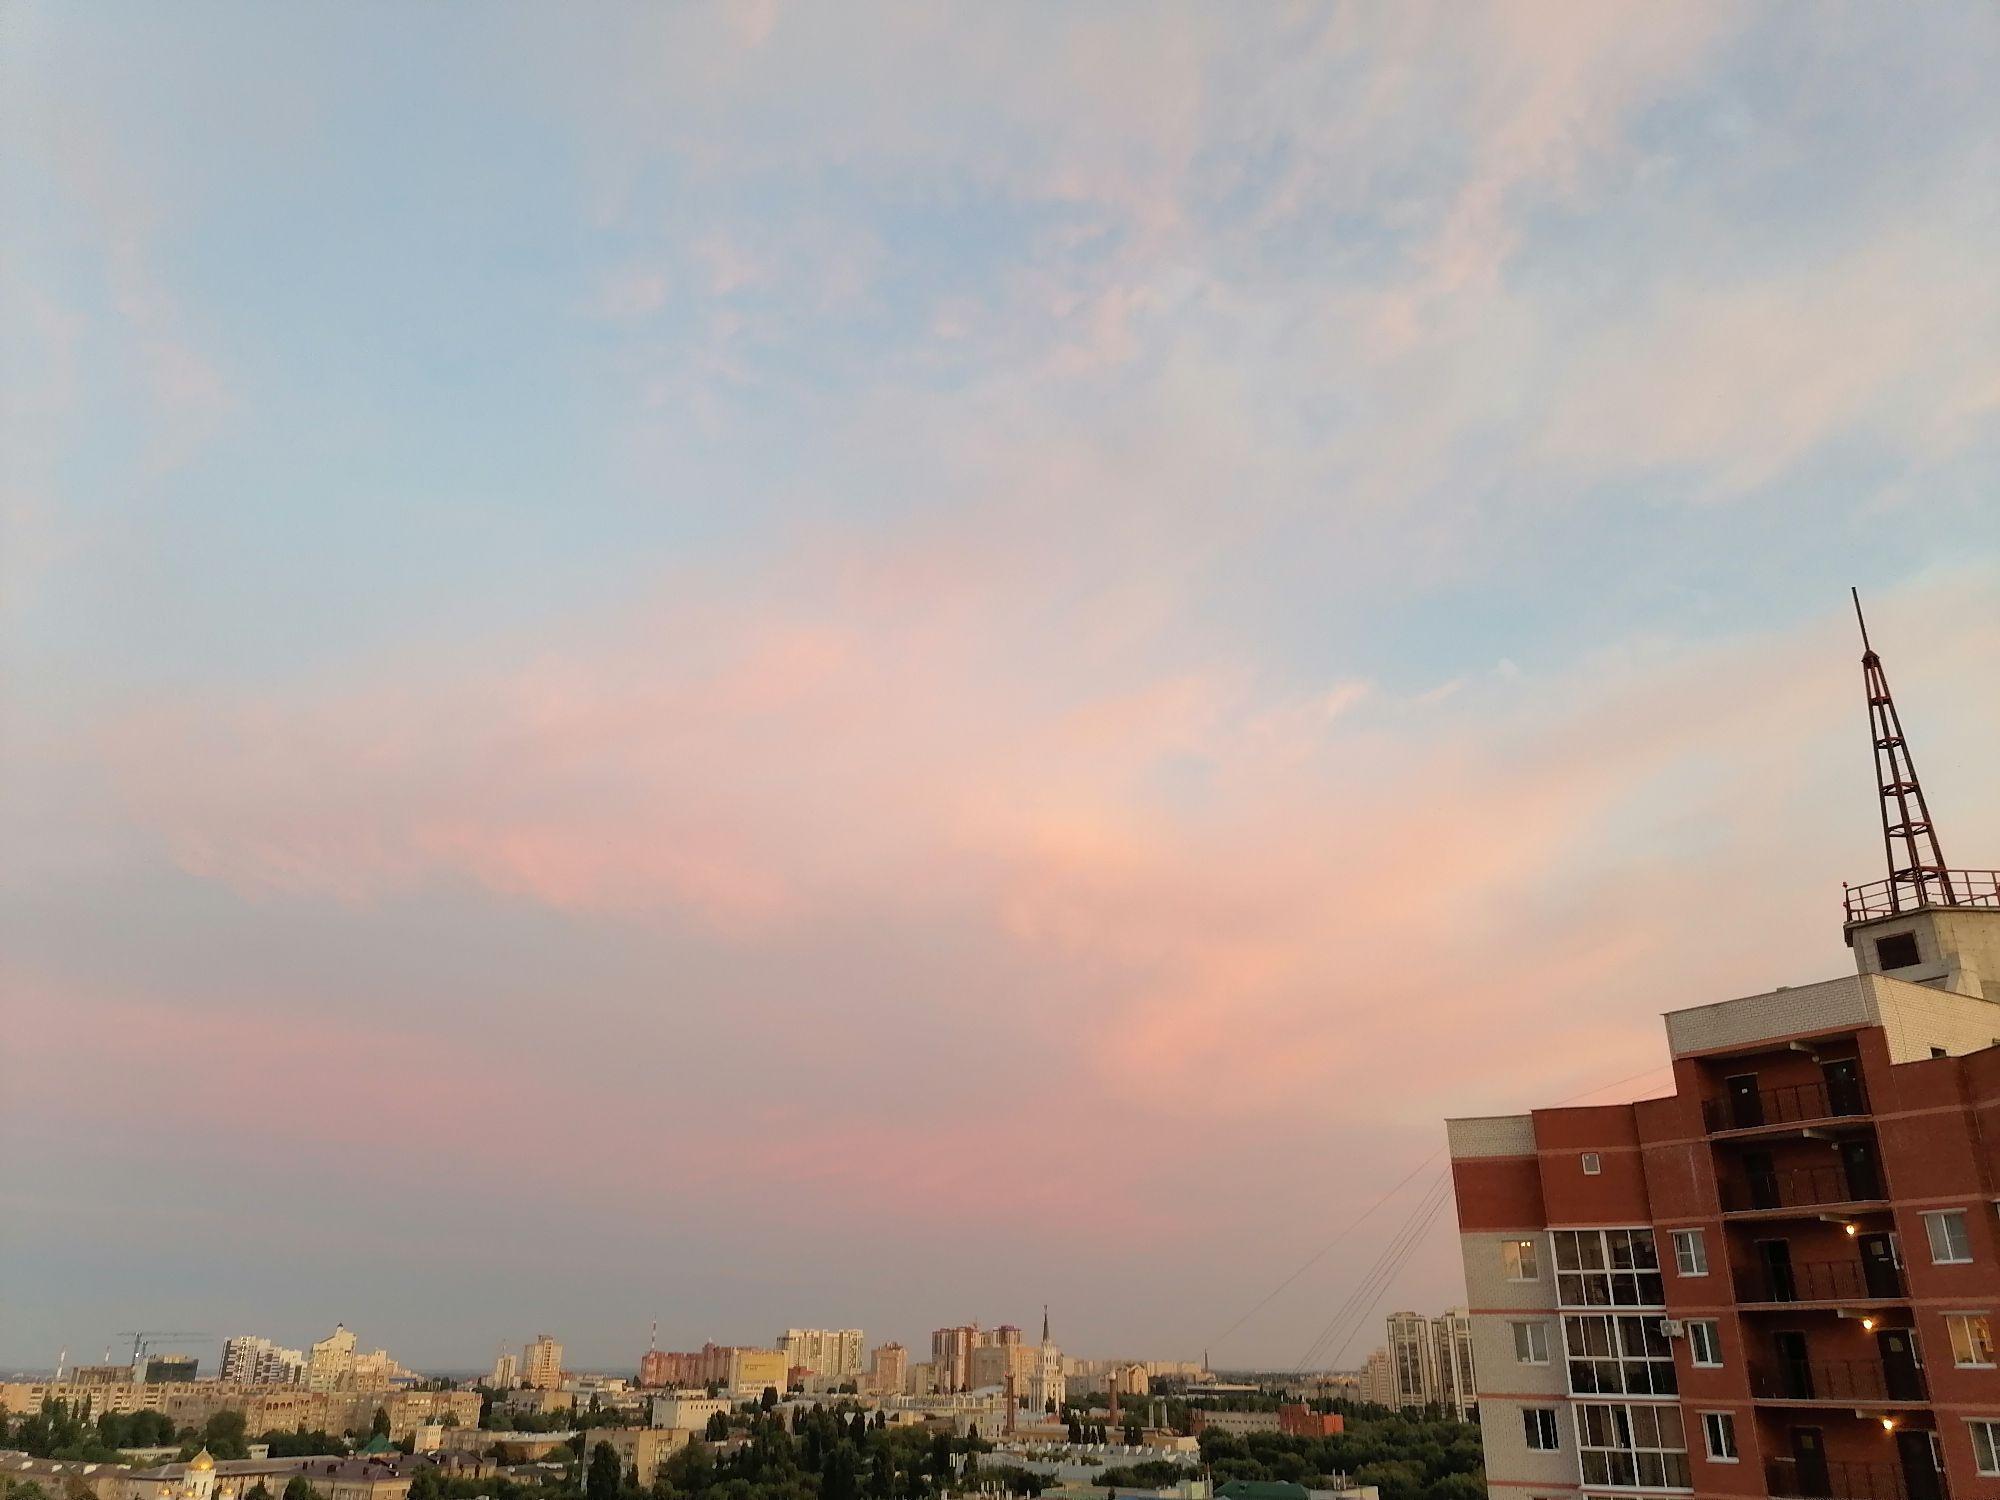 Вечернее небо над Воронежем